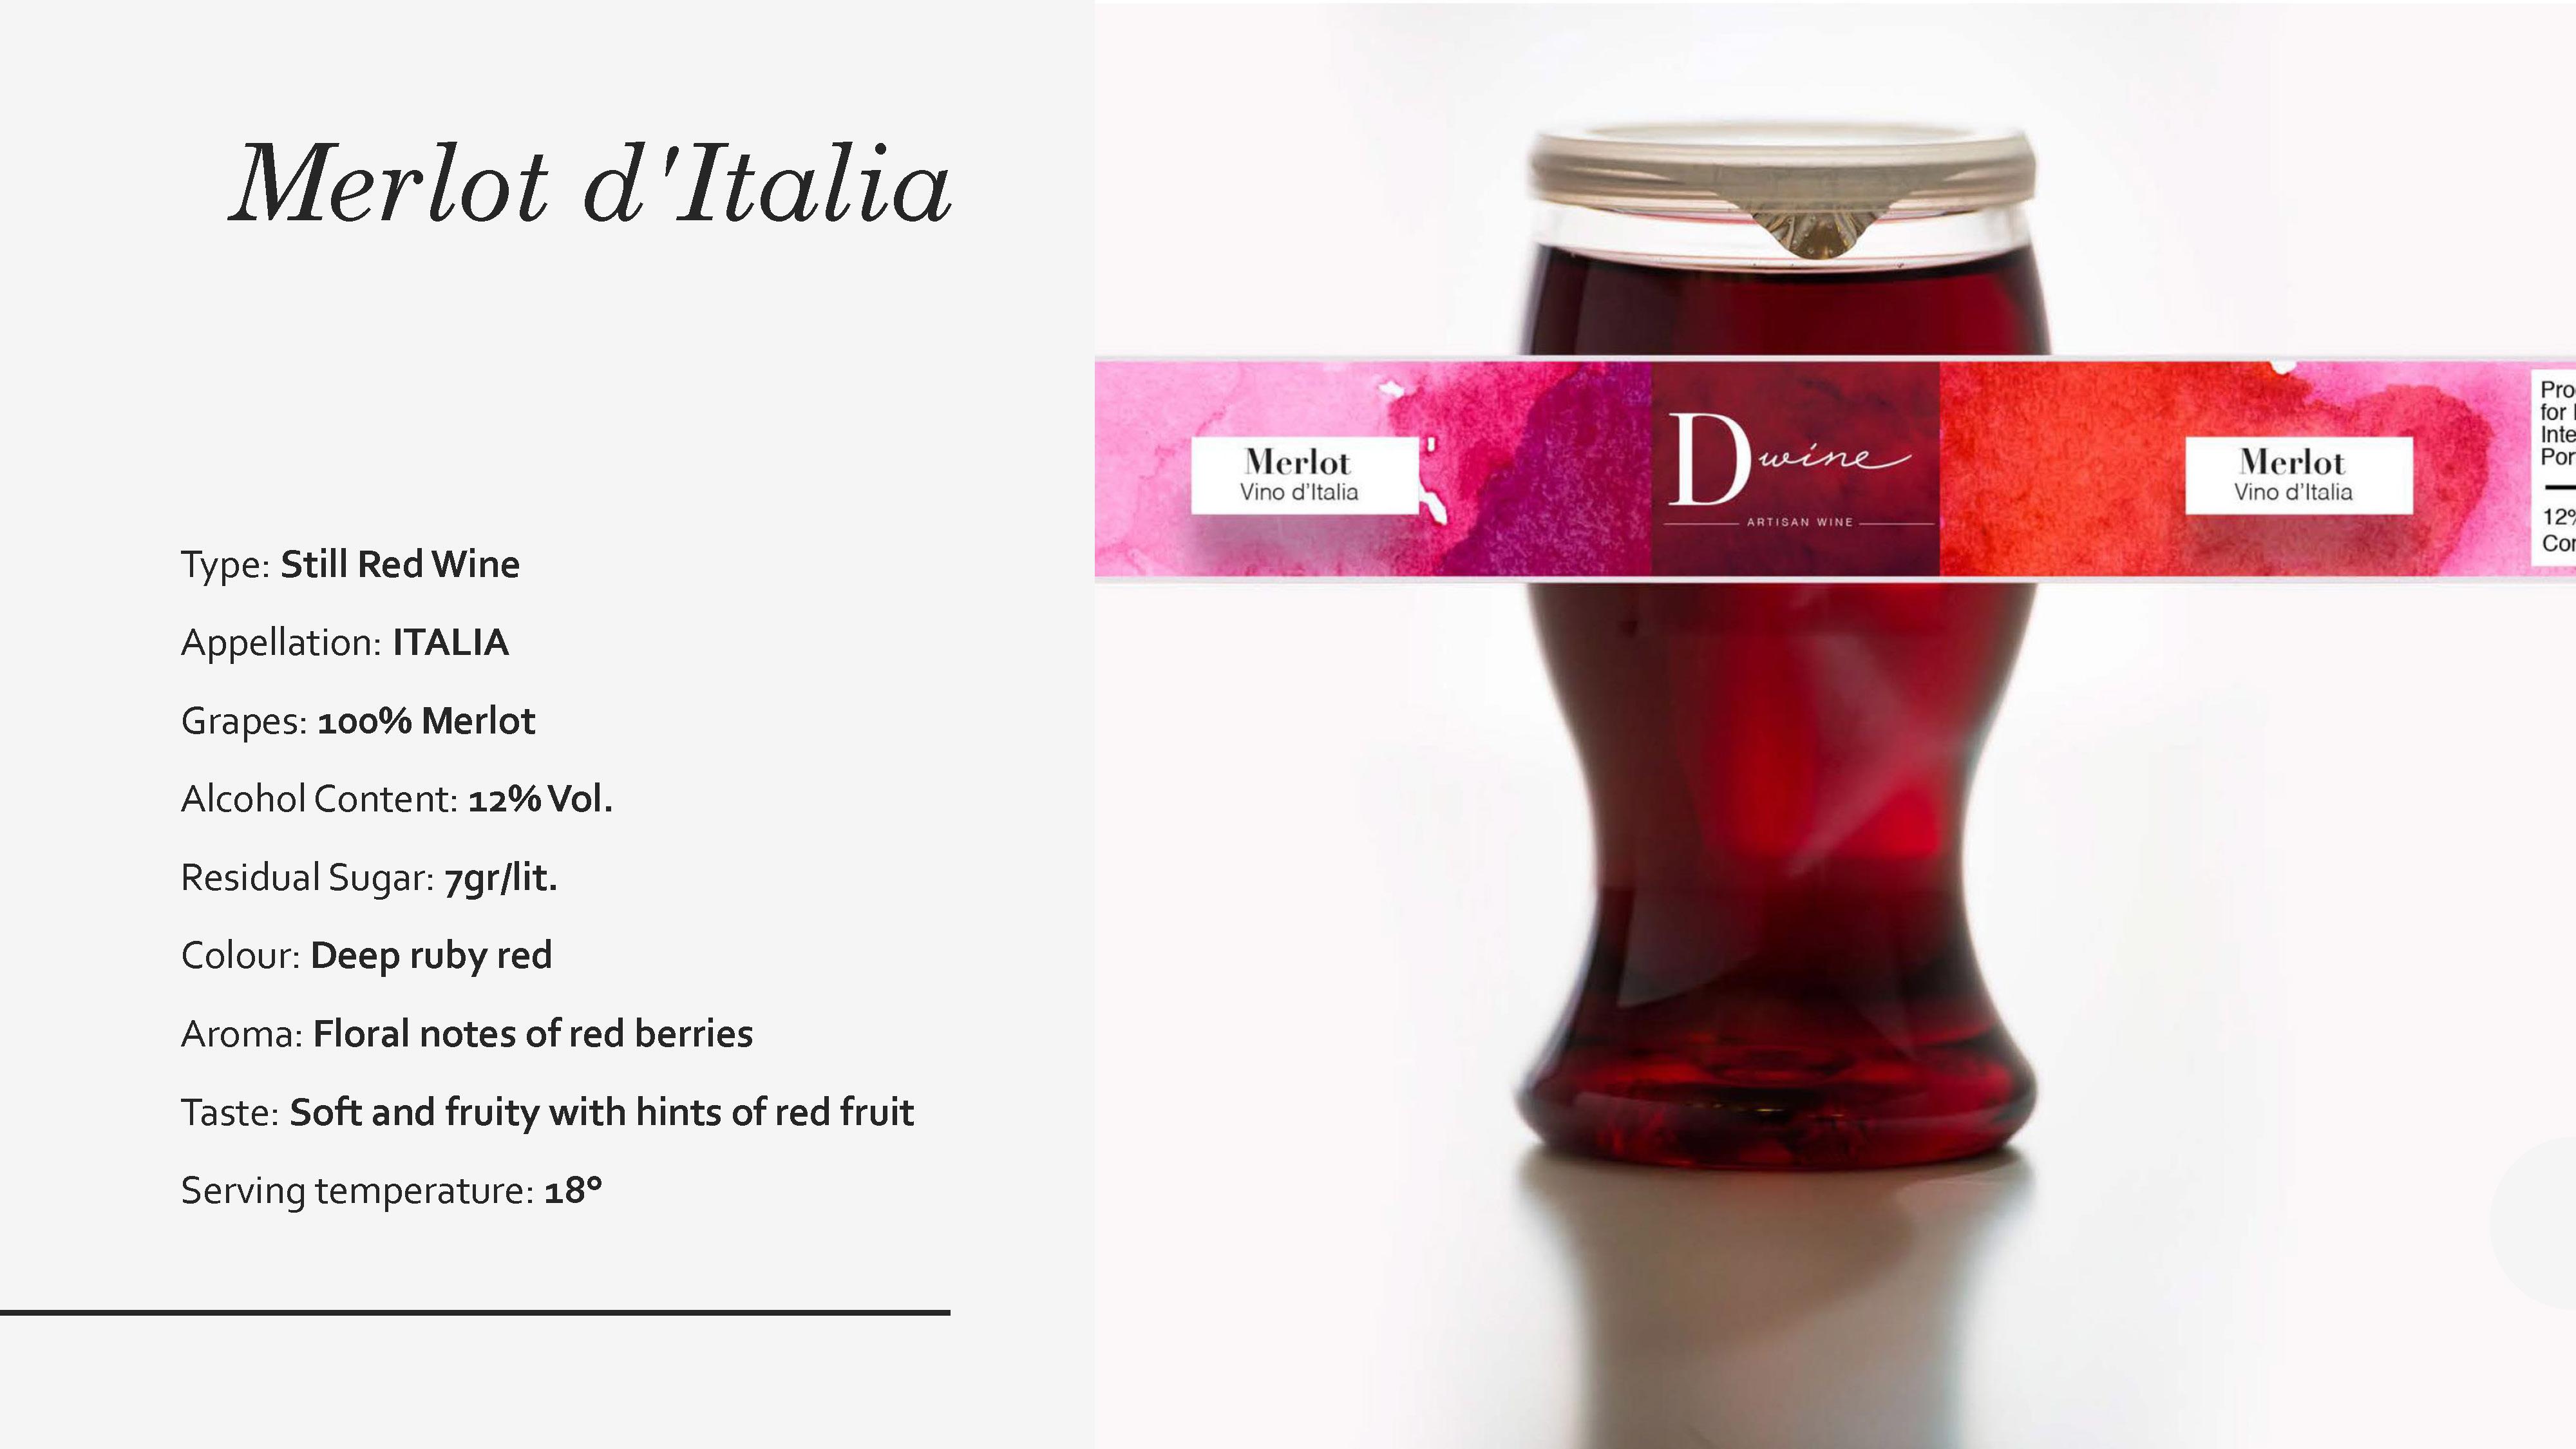 Dwine-Merlot-d-italia